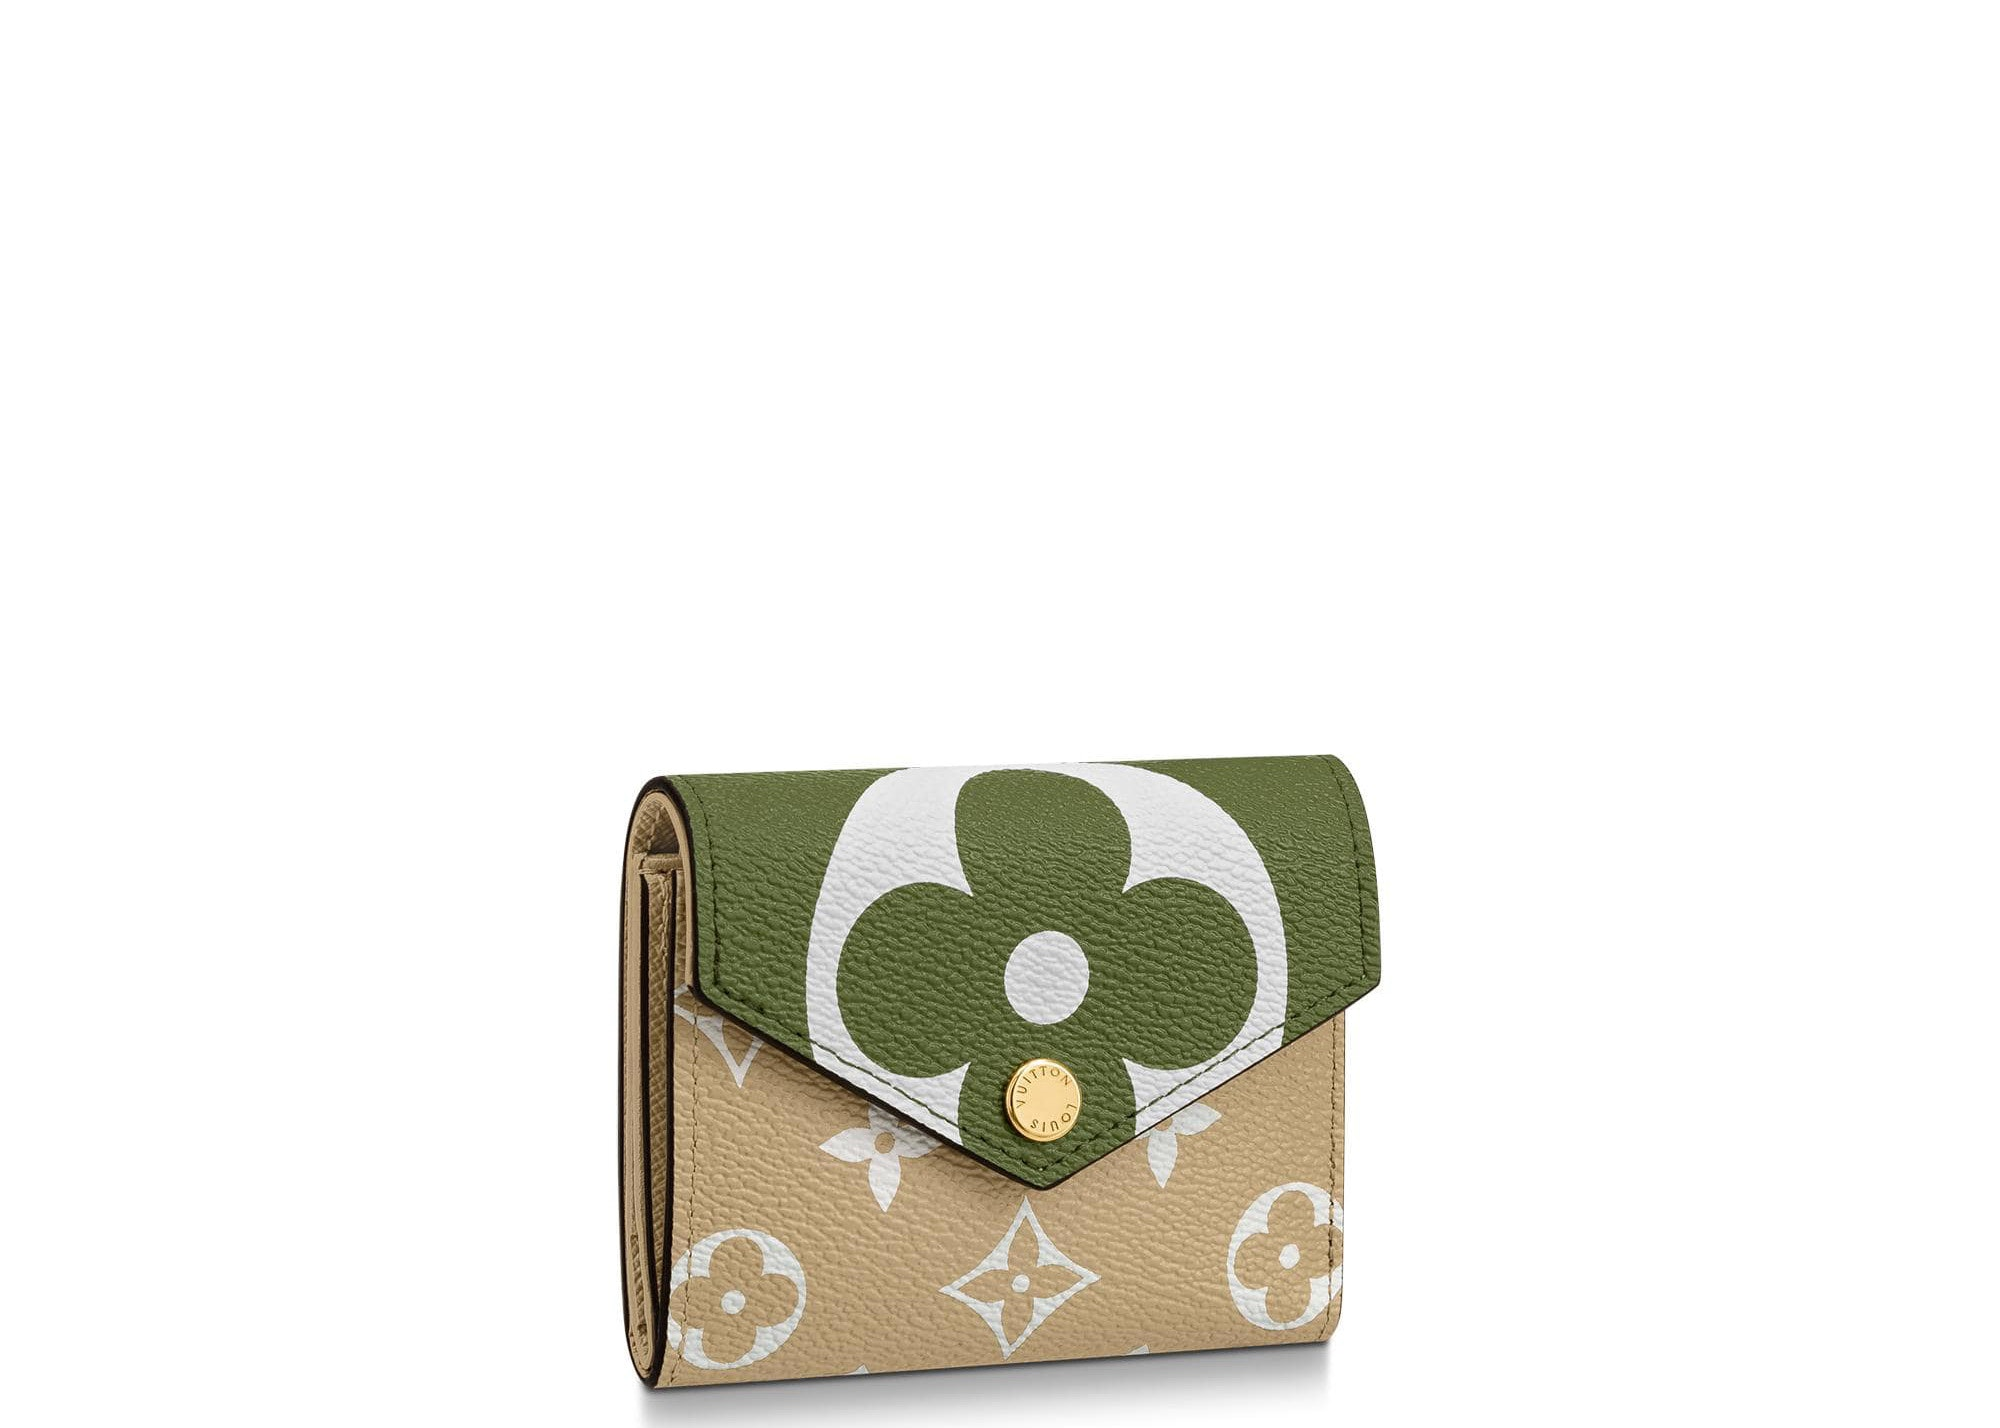 Louis Vuitton Zoe Wallet Monogram Giant Khaki Green/Beige